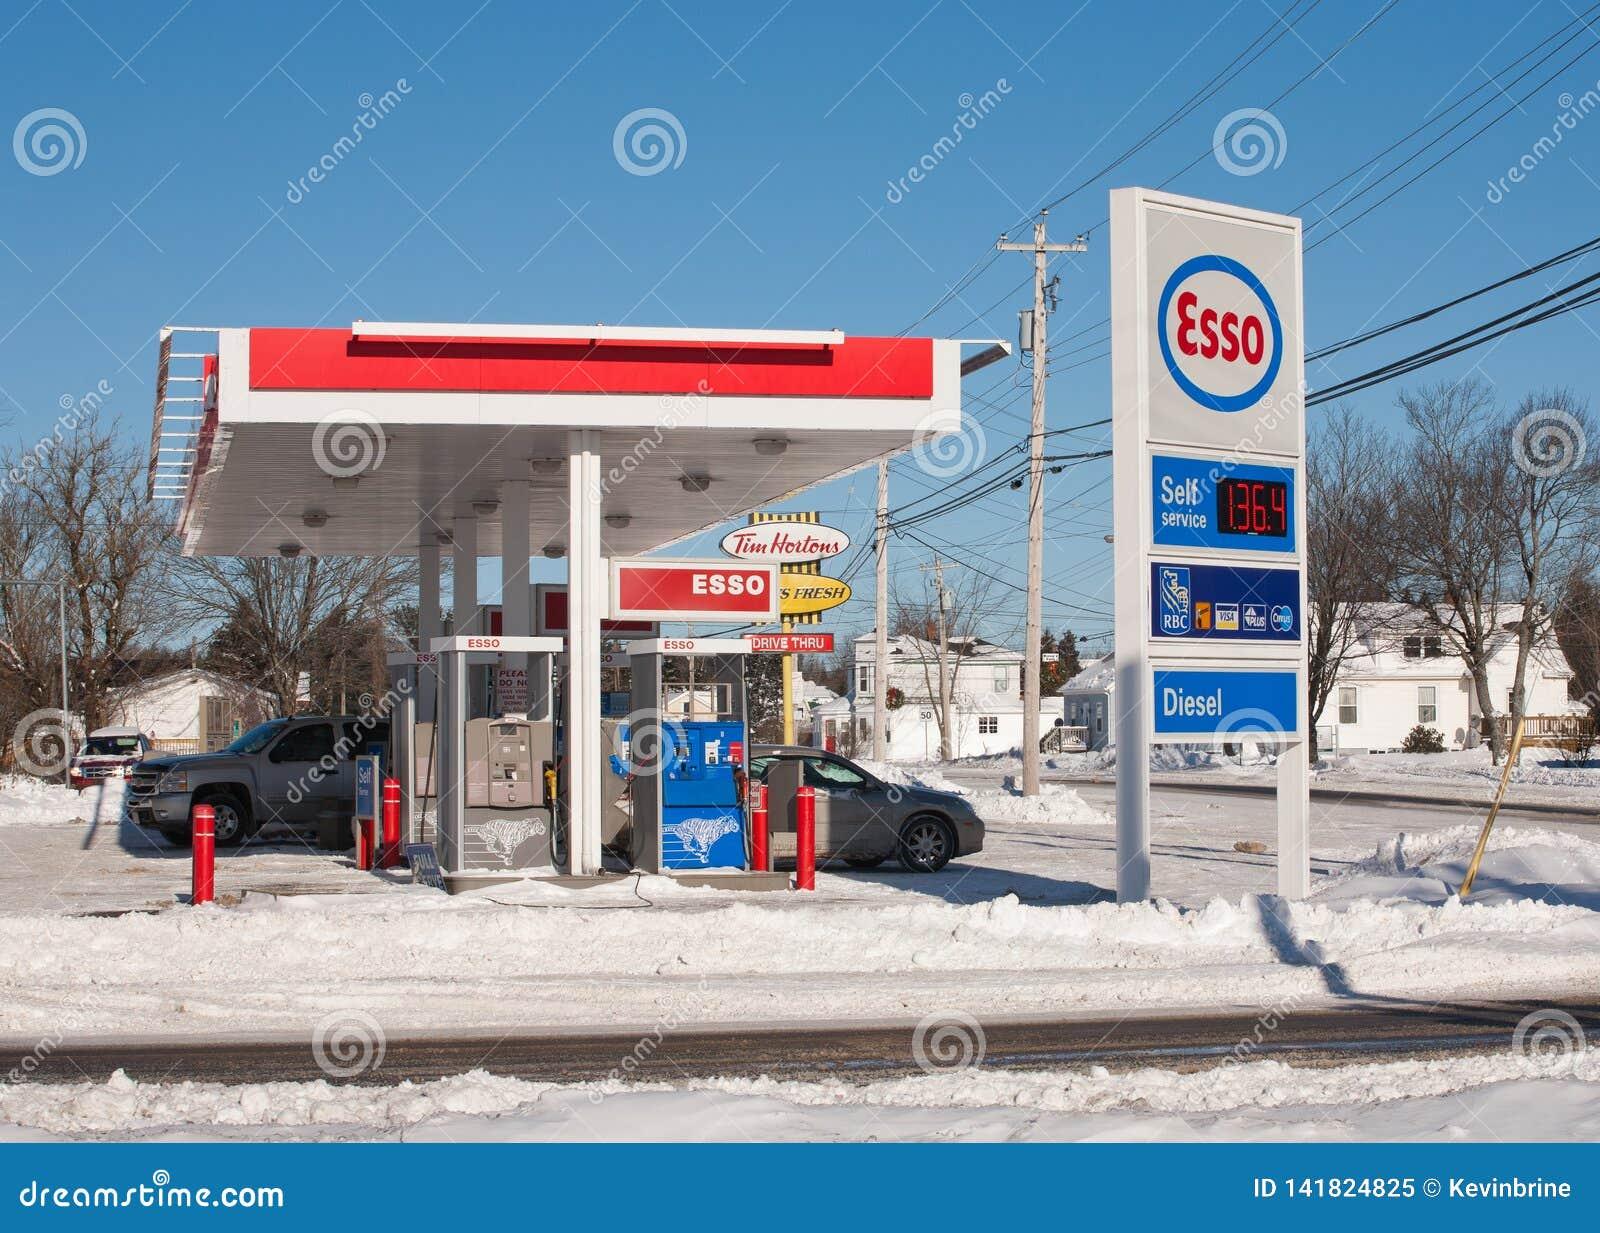 Esso Gas Station editorial image  Image of petroleum - 141824825